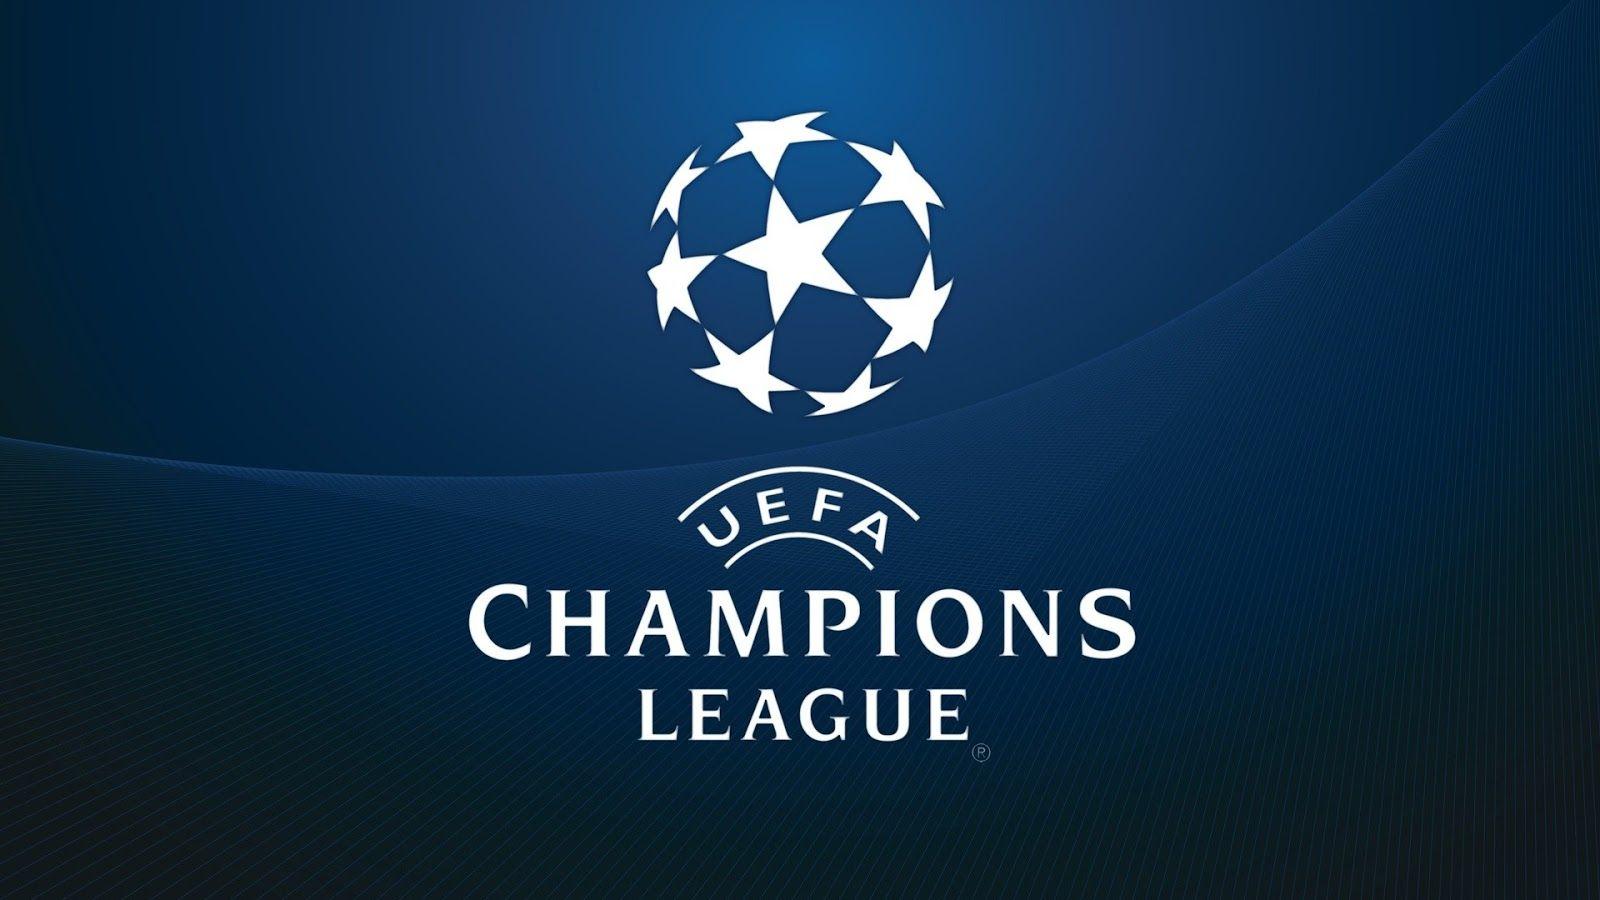 champions league Champions league logo, Uefa champions